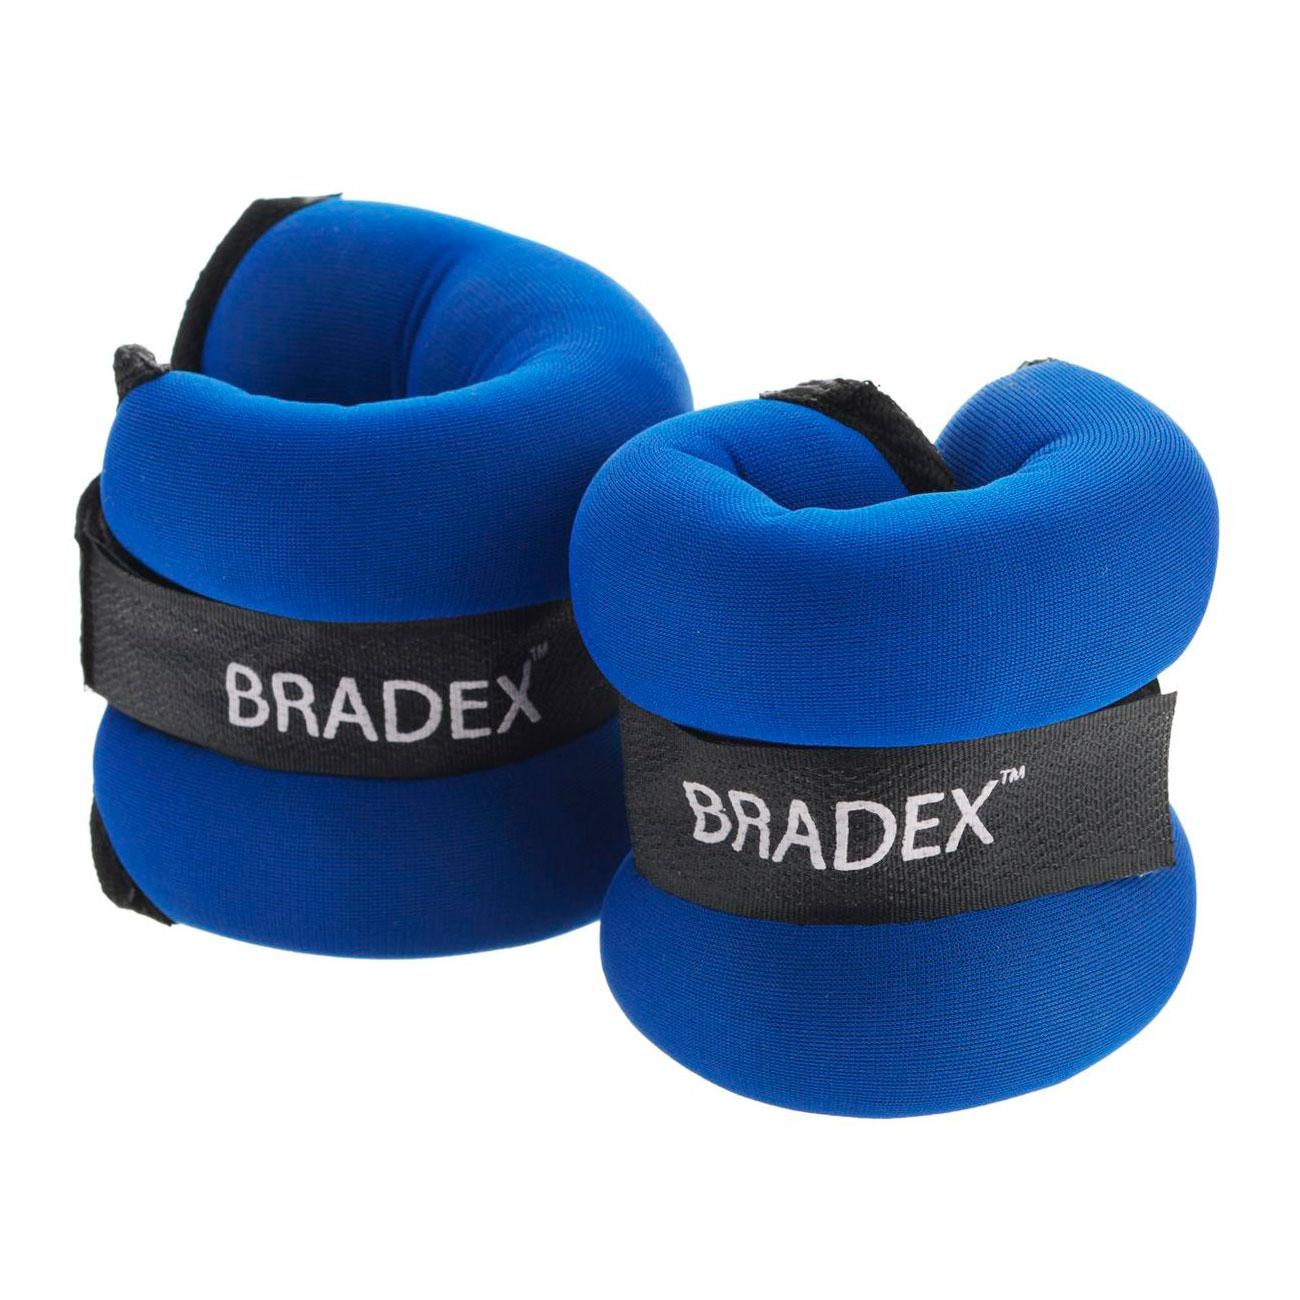 Утяжелители Bradex Геракл по 0,5 кг пара